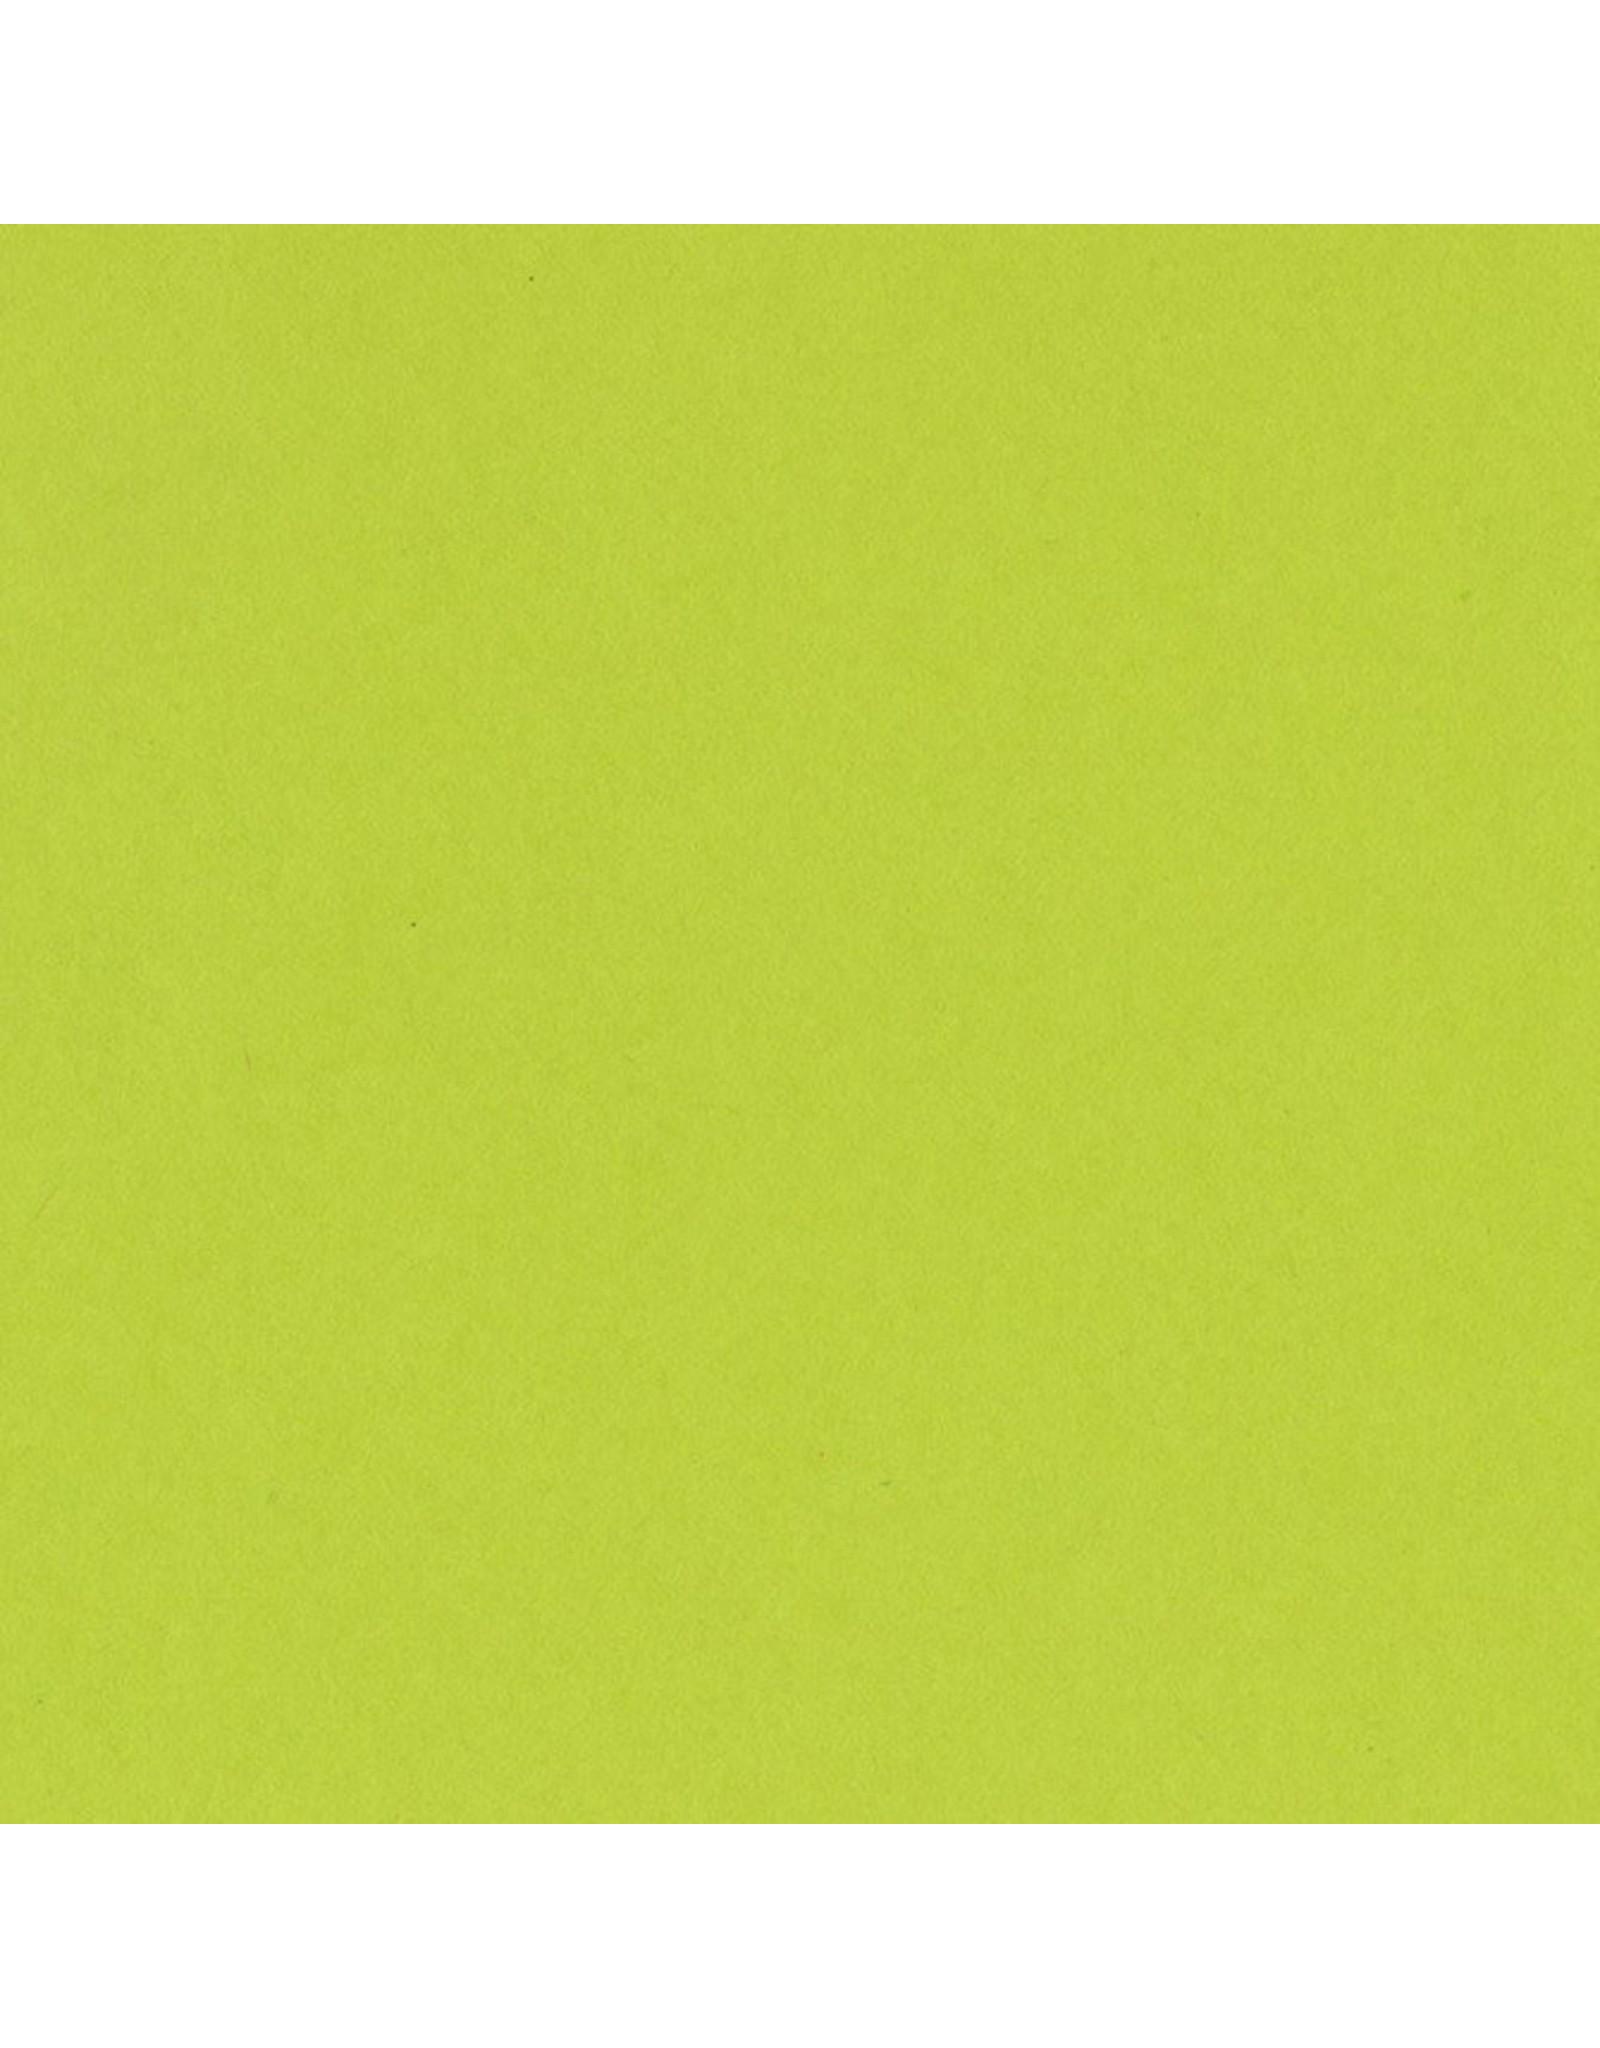 Bazzill Bazzill Card Shoppe 8.5x11 - Juicy Pear